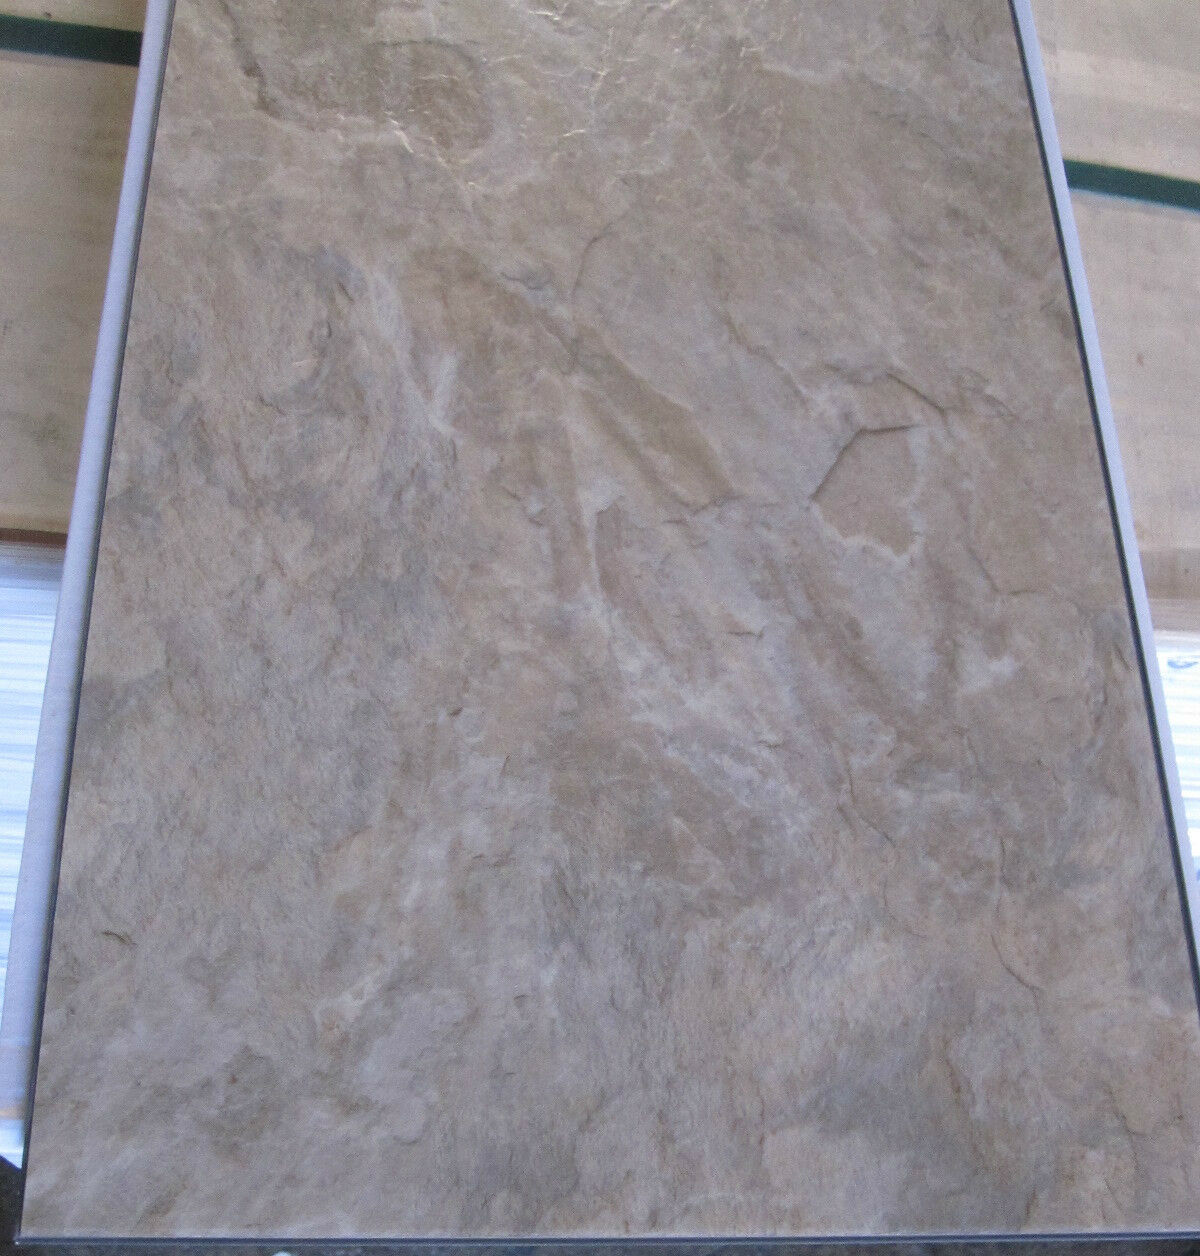 42 m vinyl click pvc fliesen optik marmor parkett laminat restposten topangebot ebay. Black Bedroom Furniture Sets. Home Design Ideas